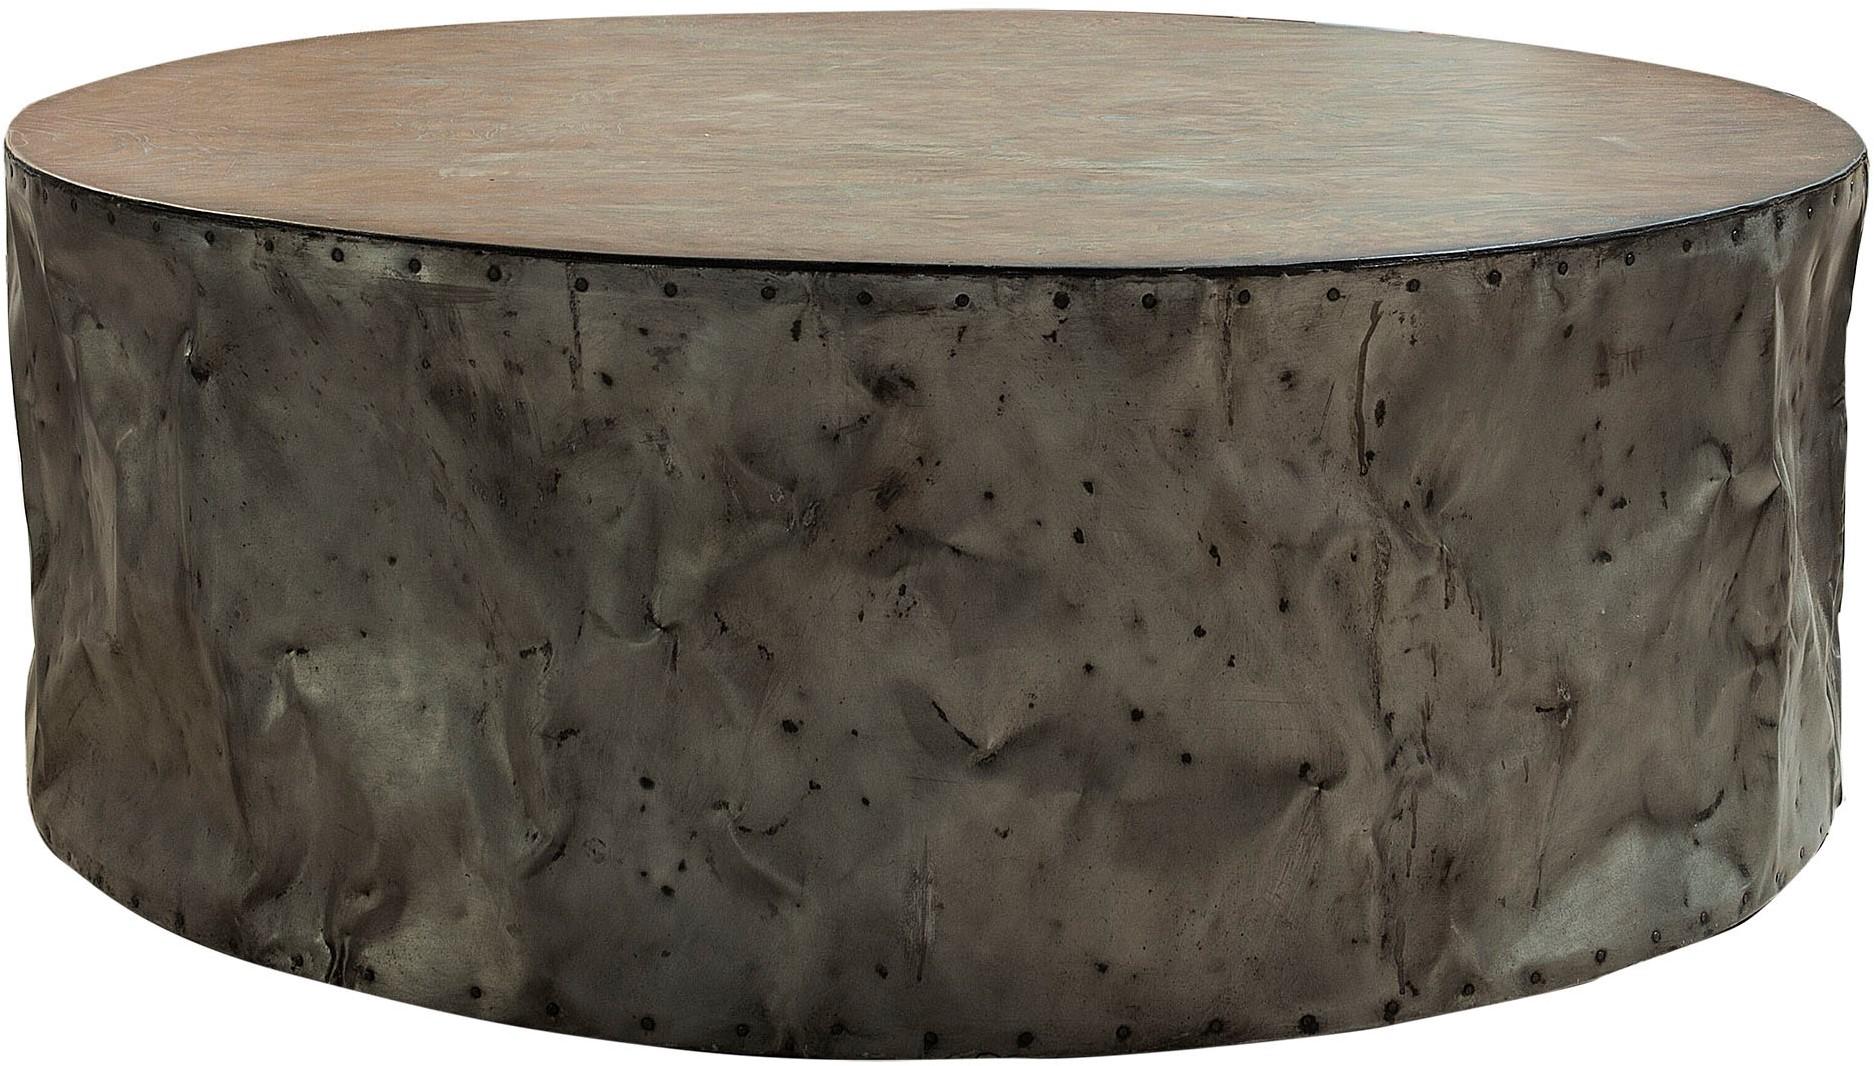 Salontafel drum rustic grey rond bij nano interieur